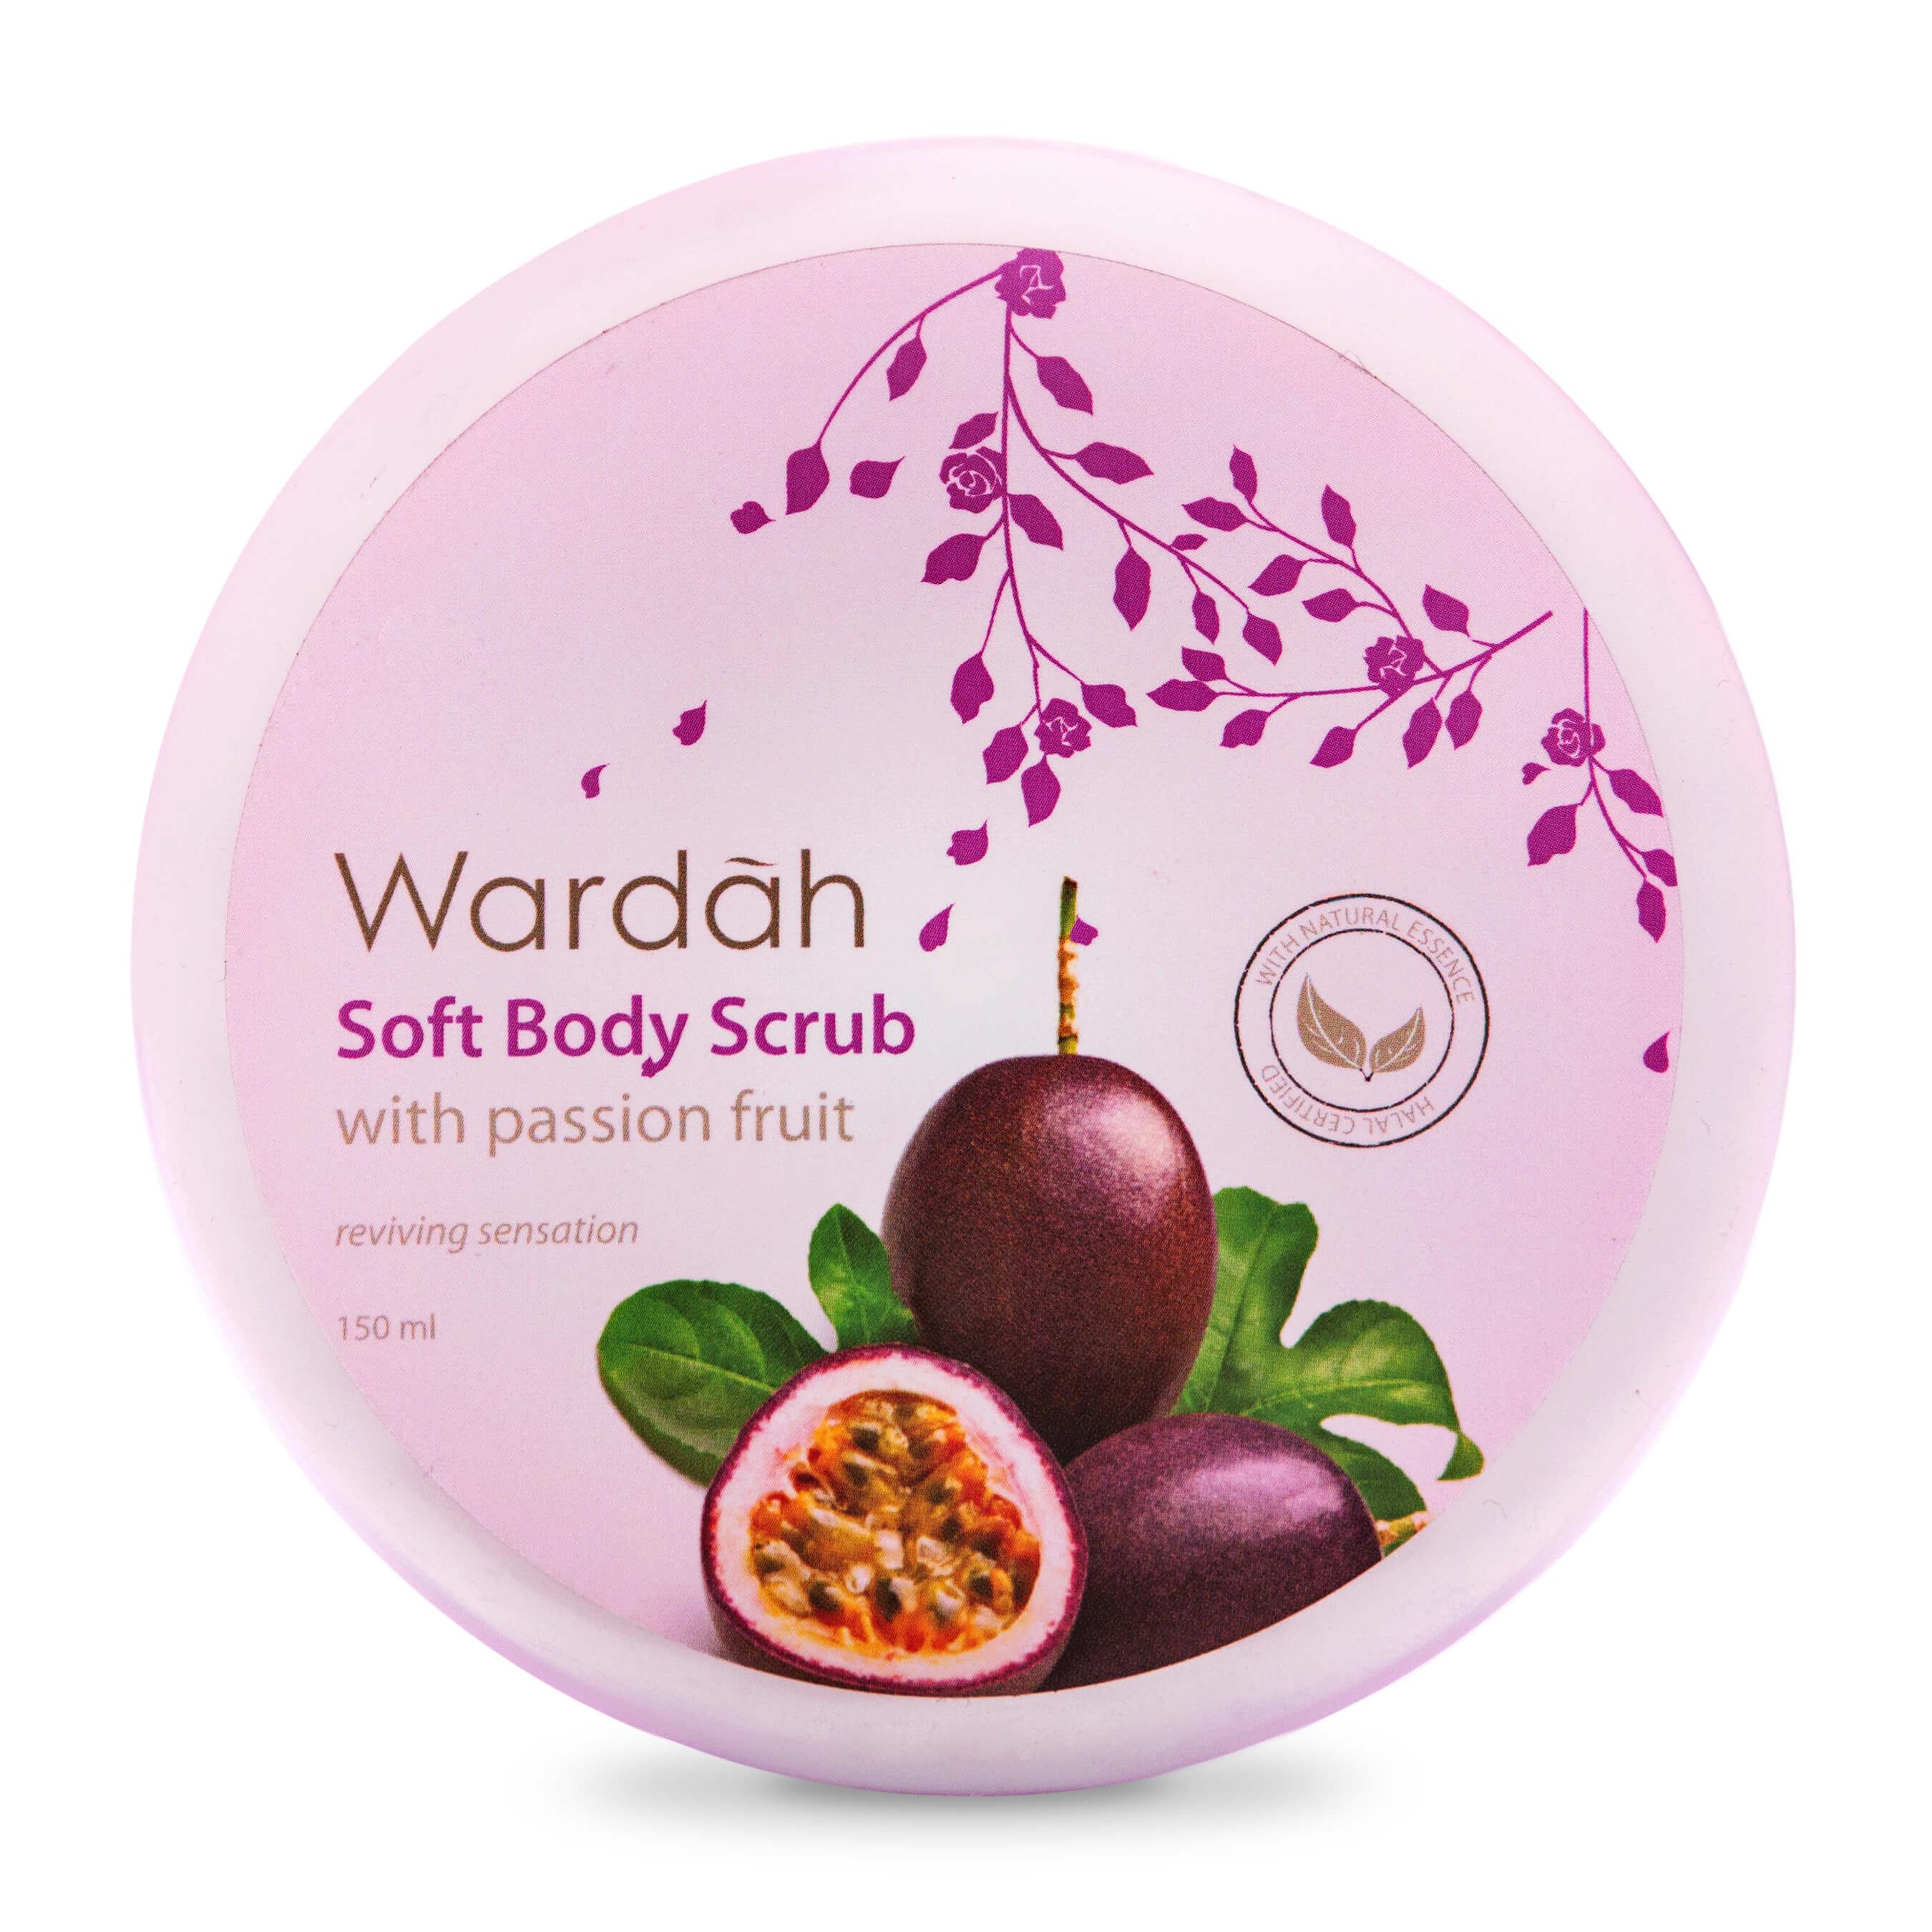 Wardah Soft Body Scrub.jpg